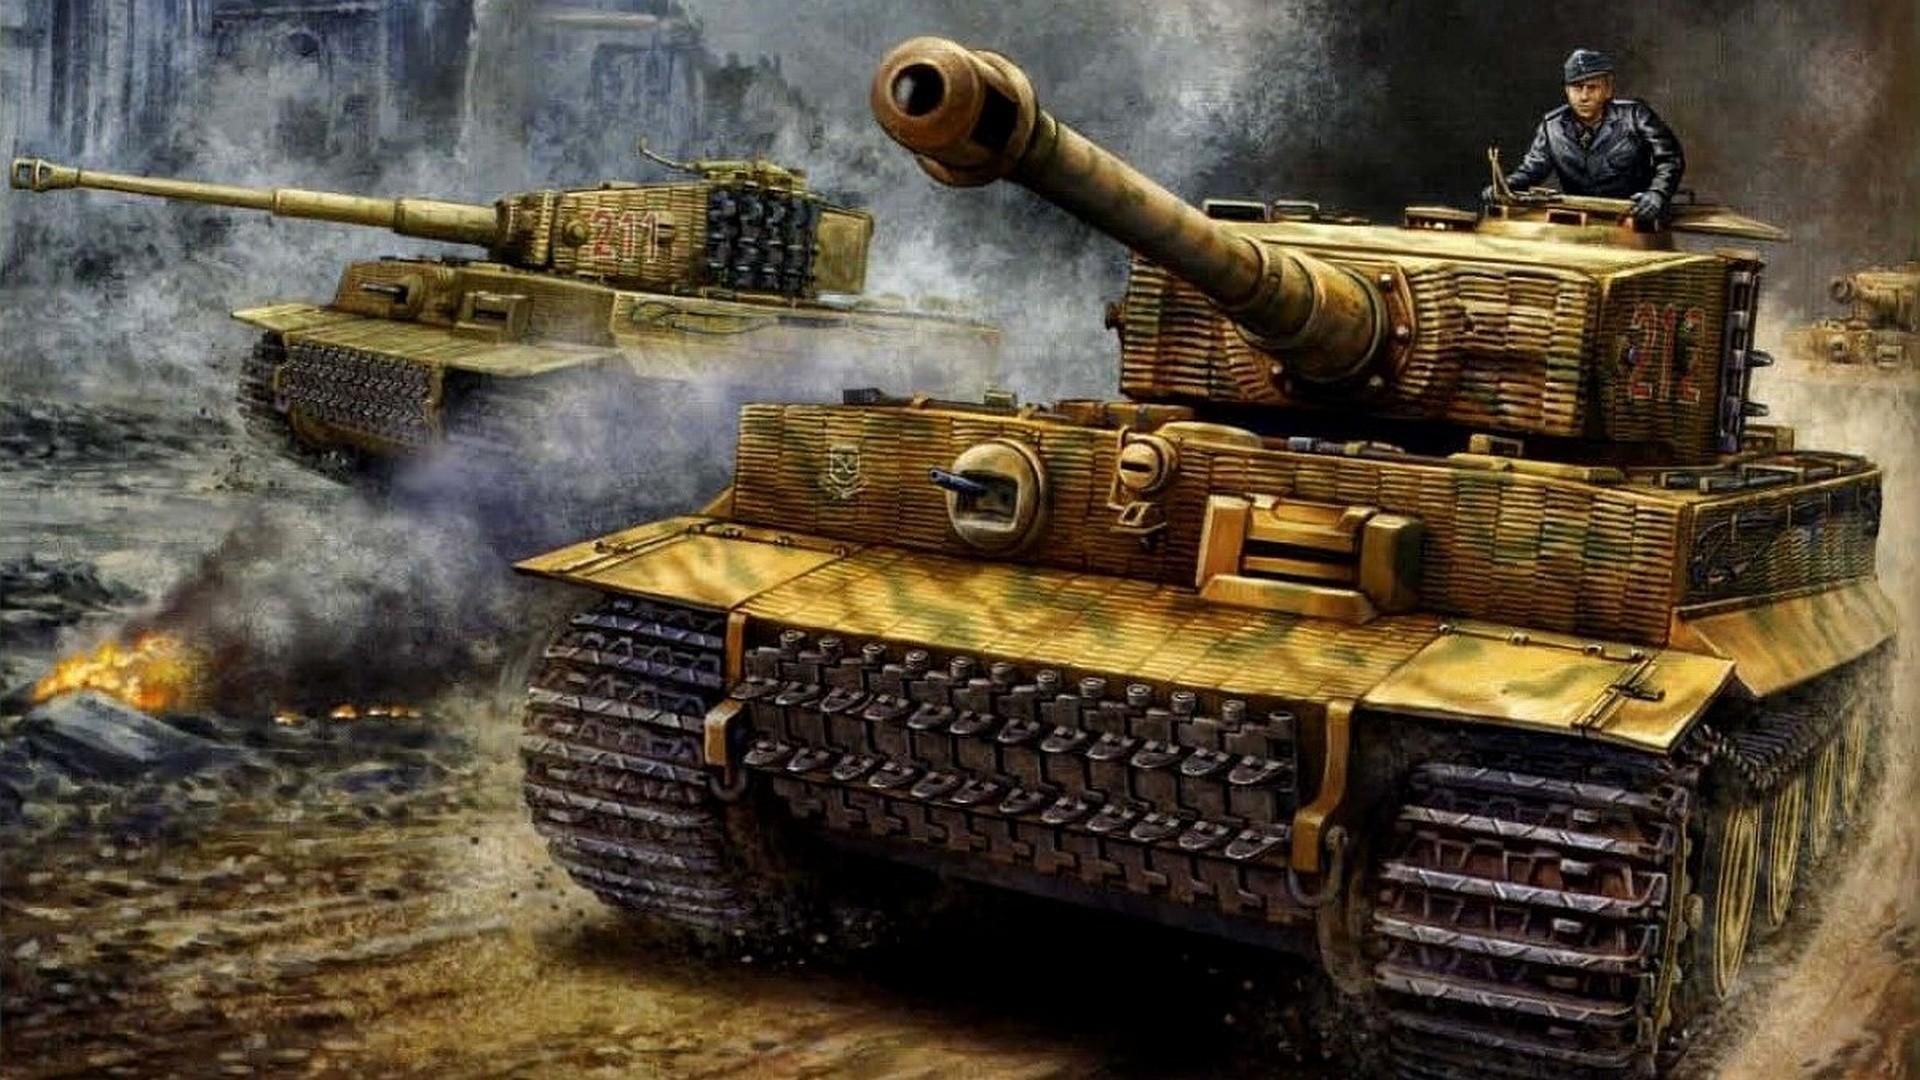 Military Tank Wallpaper Military, Tank